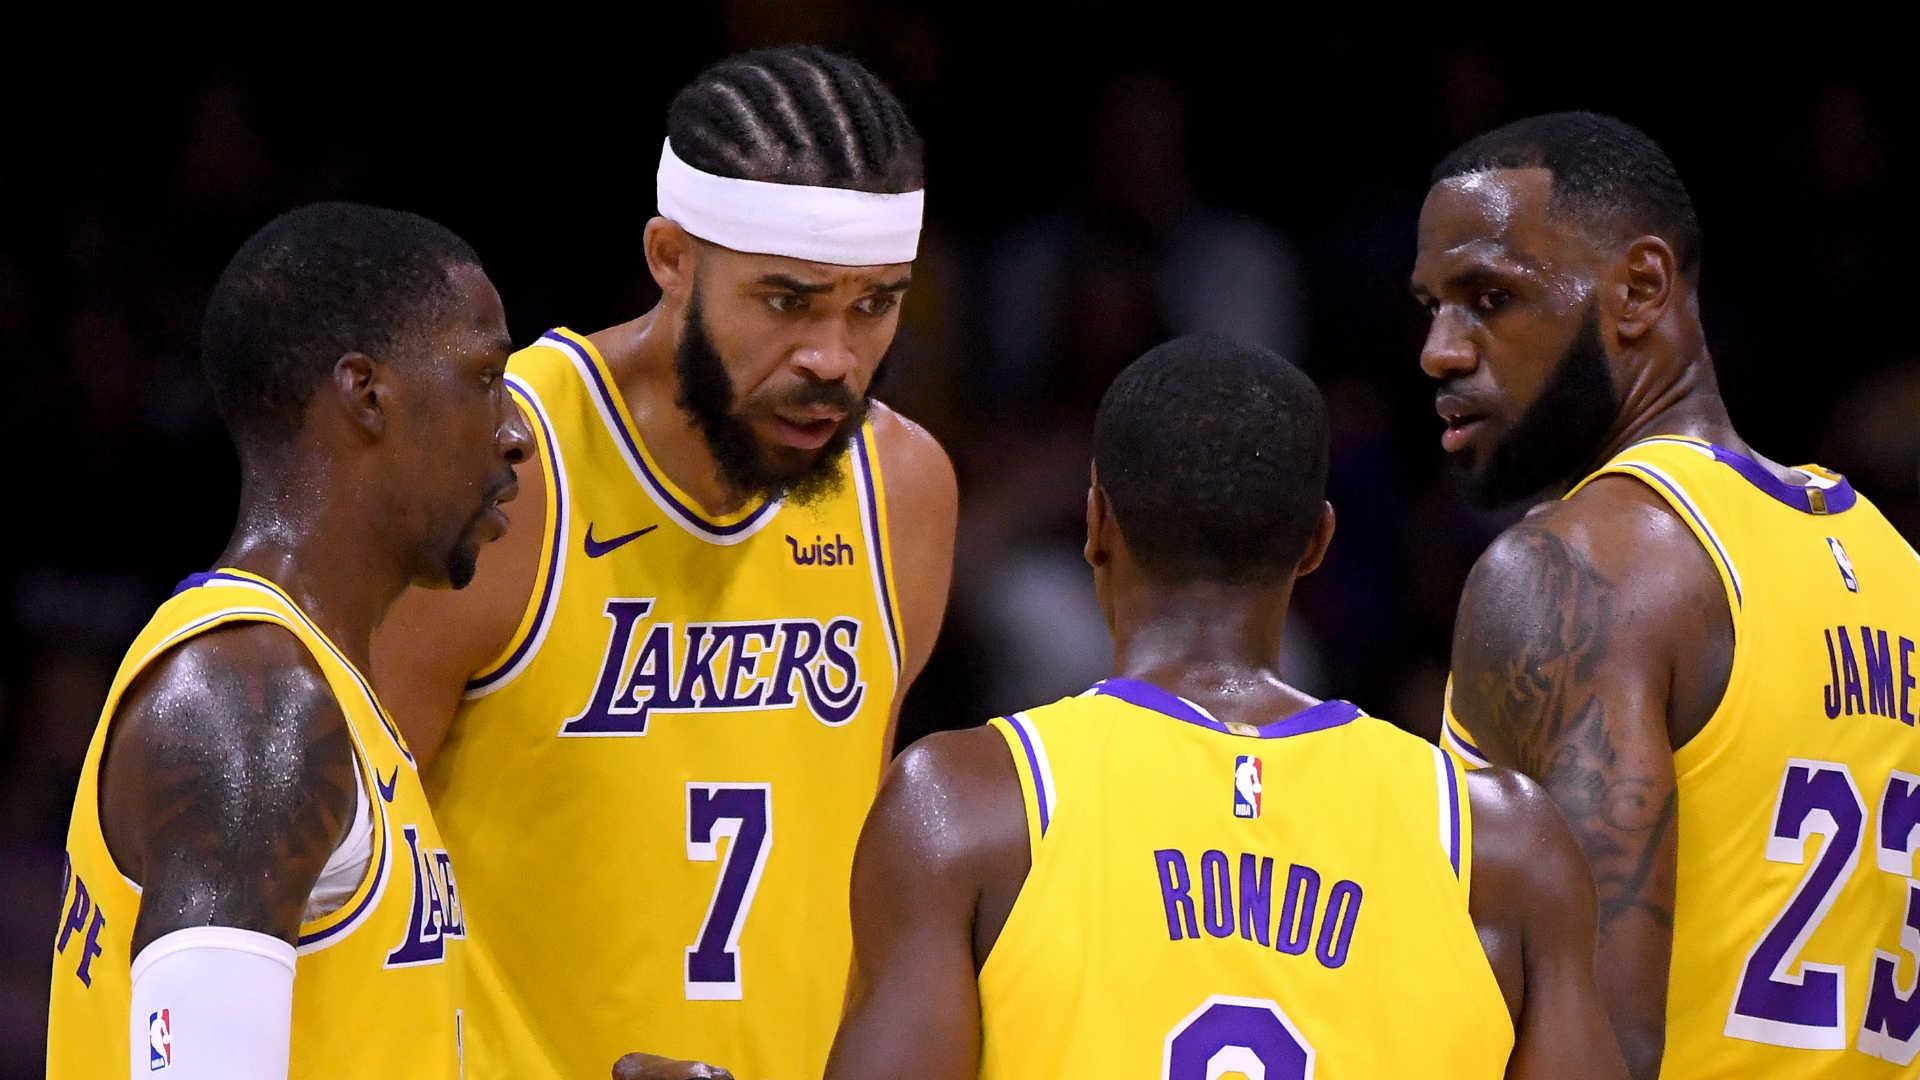 Миннесота — Лейкерс. Прогноз на матч 30 октября 2018. НБА